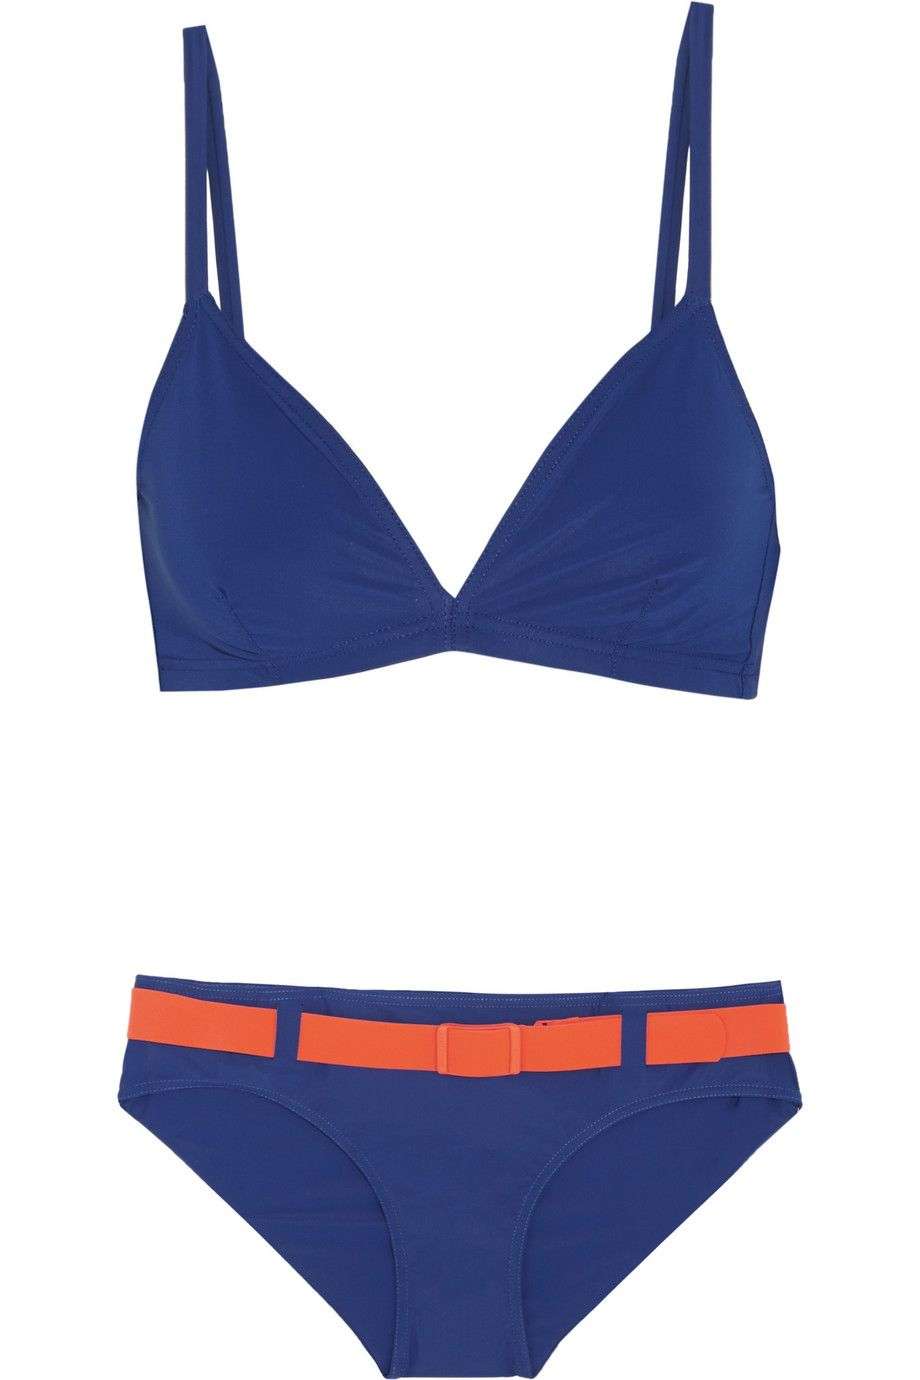 Orlebar Brown|Hampton and Balmoral triangle bikini|NET-A-PORTER.COM